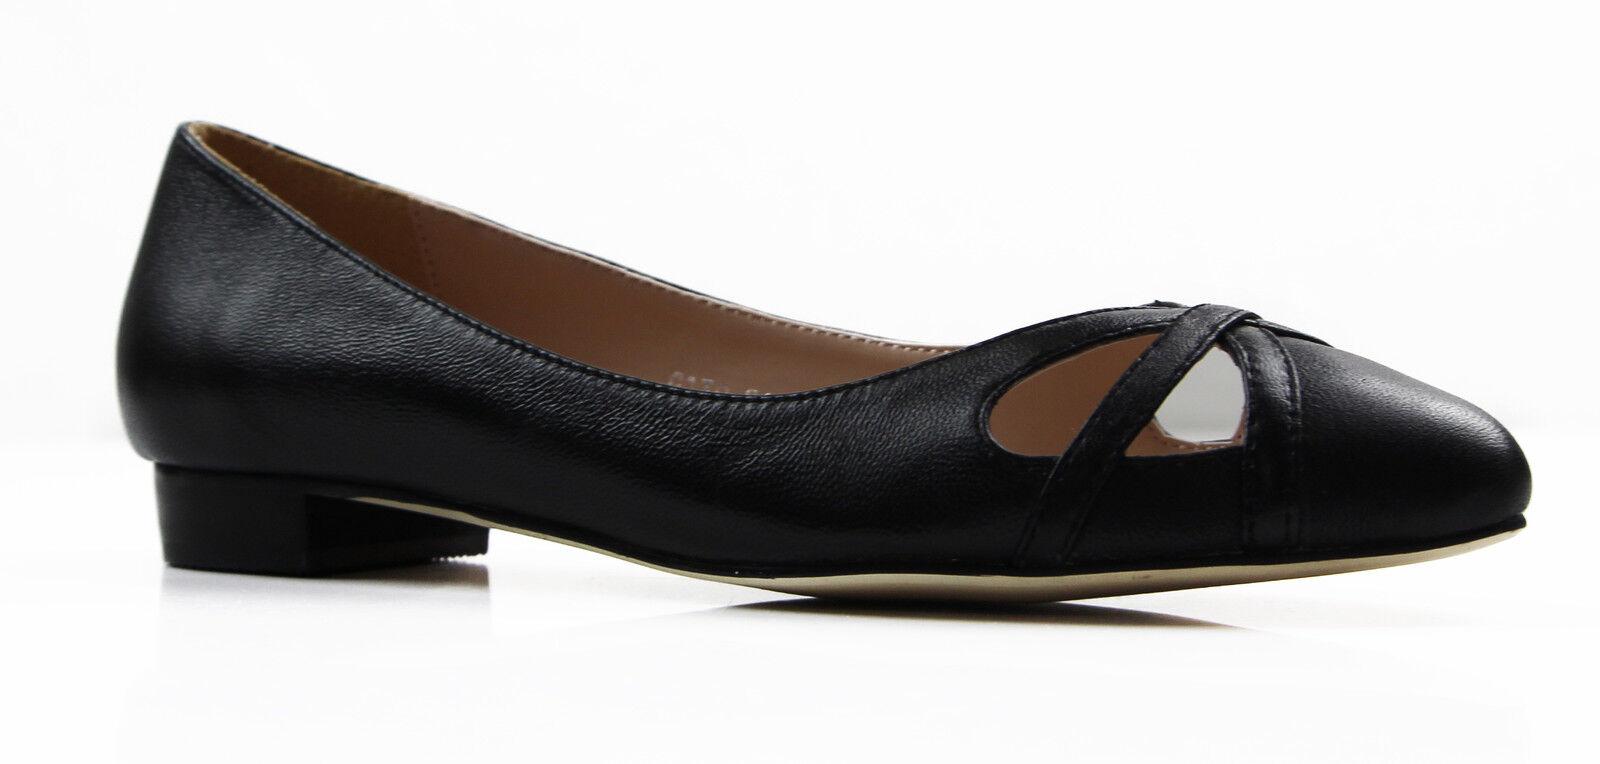 NEW LADIES Damenschuhe Damenschuhe LADIES BLACK ZASEL LEATHER FLAT POINTY FLATS DRESS WORK CASUAL Schuhe 4a4f33